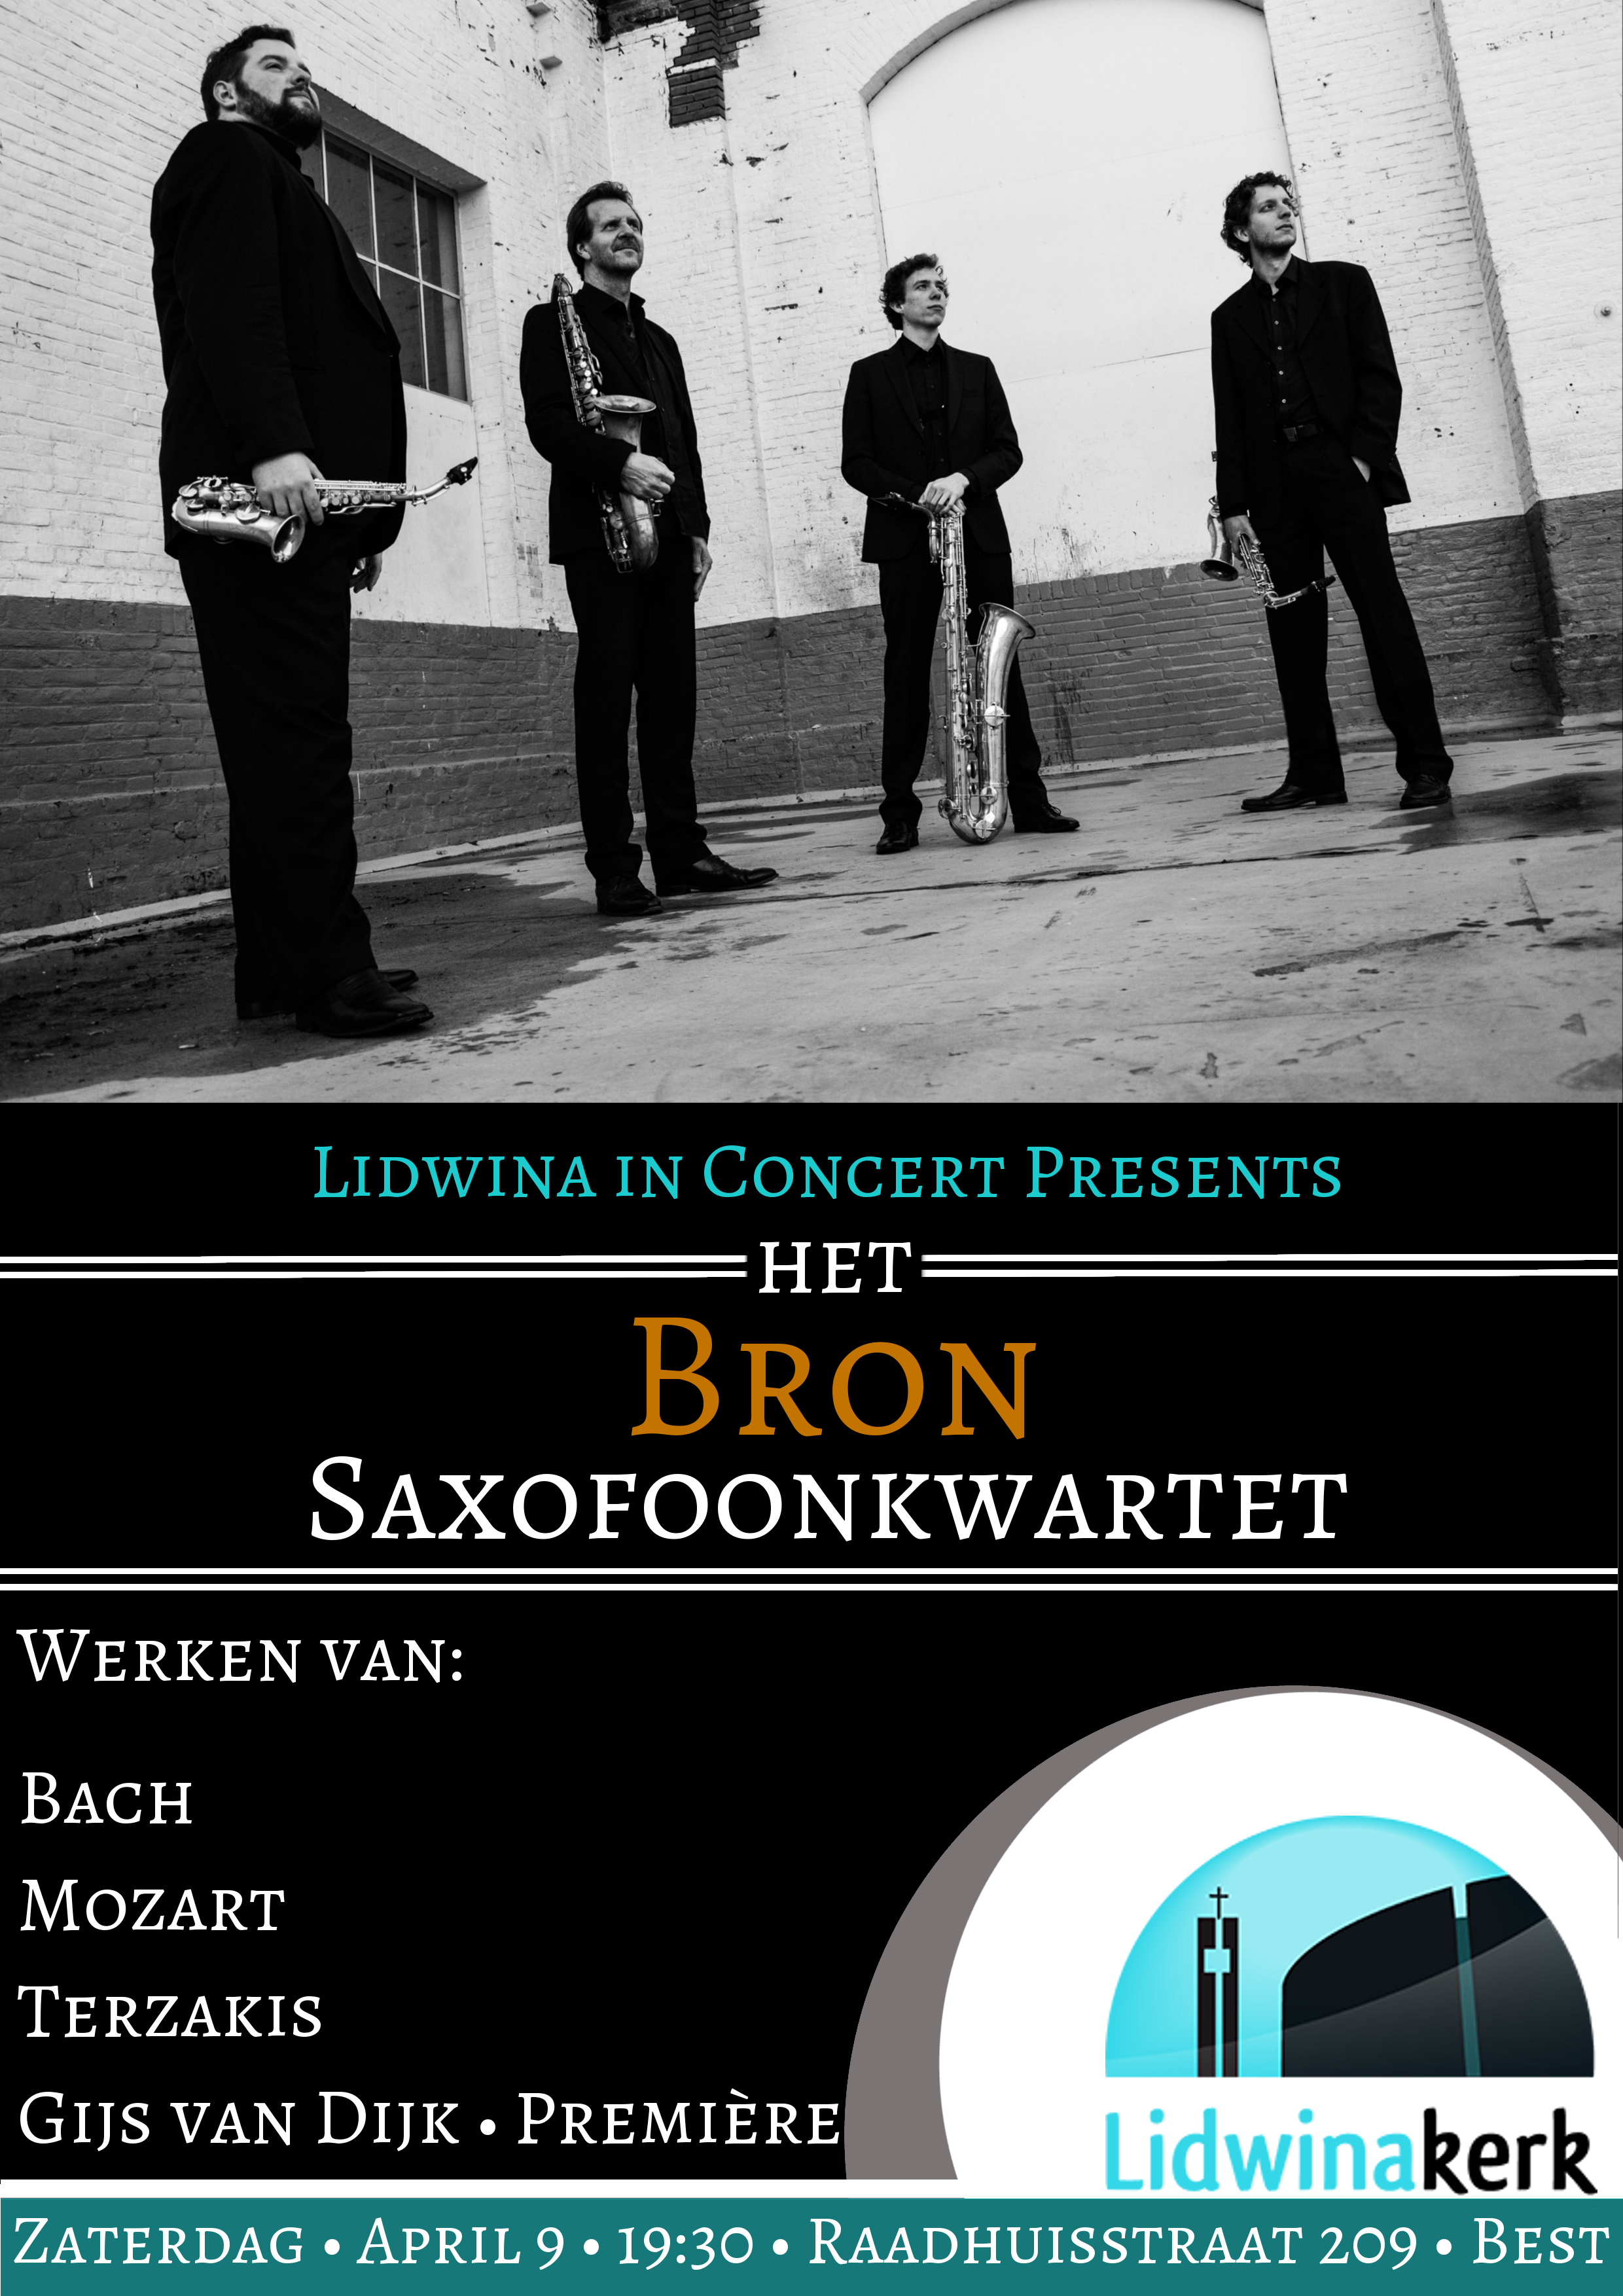 Lidwinakerk - Bron Saxophone Quartet - April 9 - Dutch.jpg